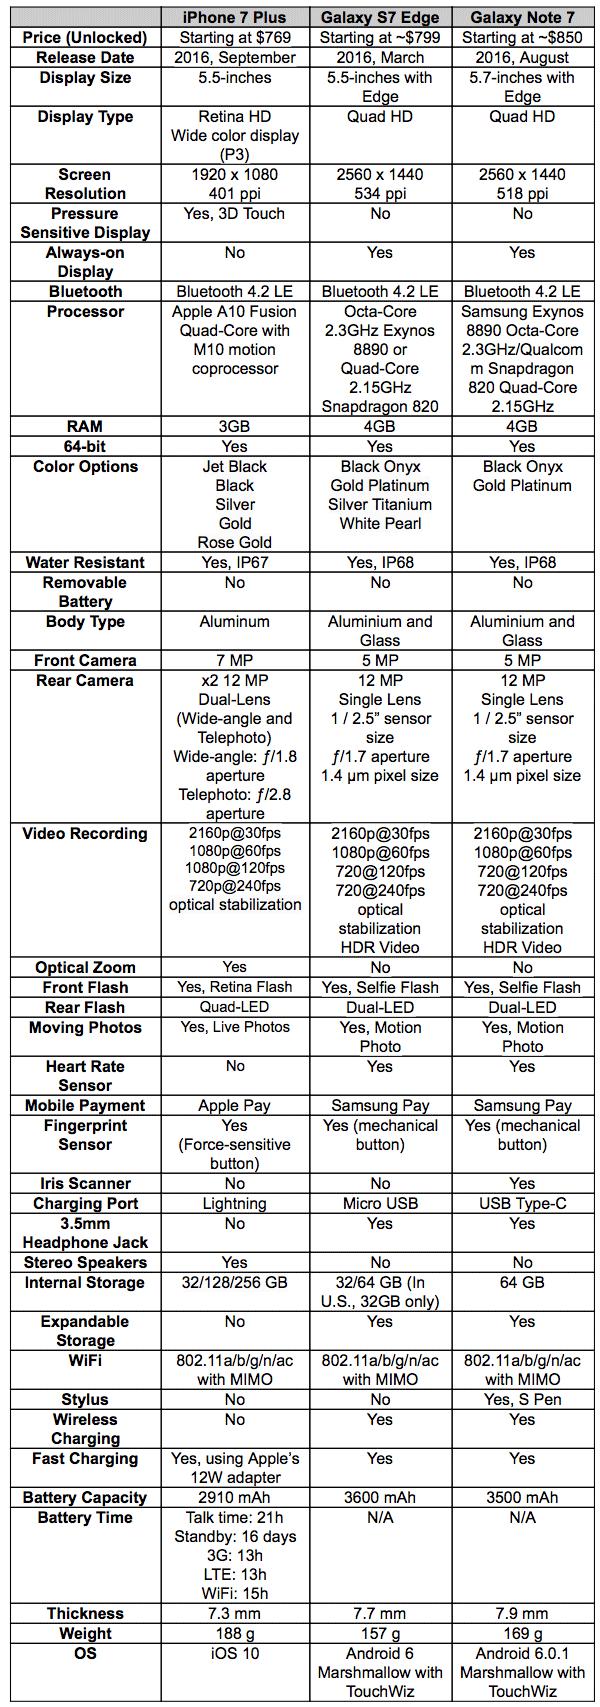 iPhone 7 Plus vs Galaxy S7 Edge vs Galaxy Note 7